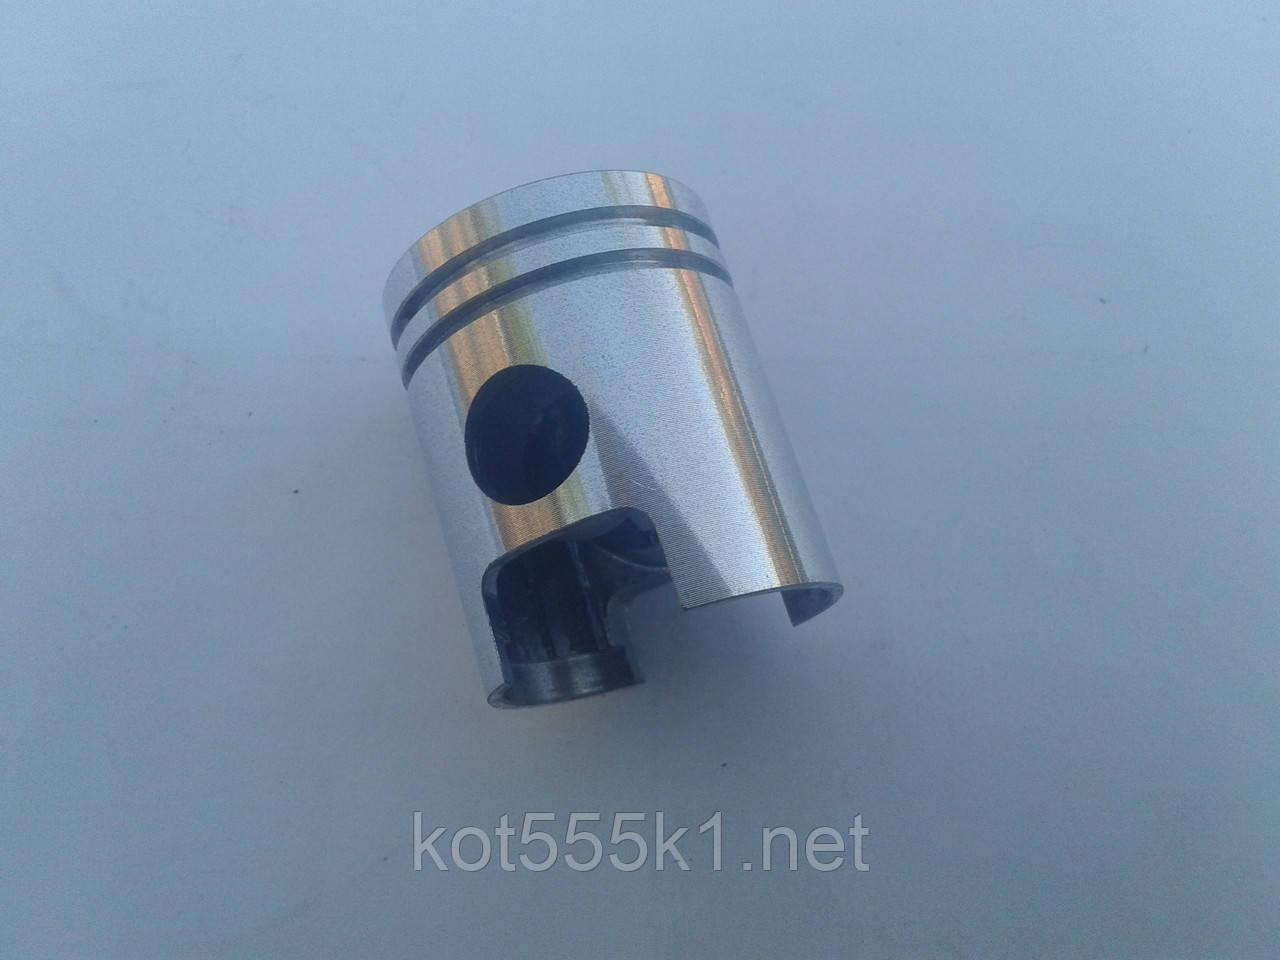 Поршень Ява Бабетта 2й ремонт (39.50 мм)